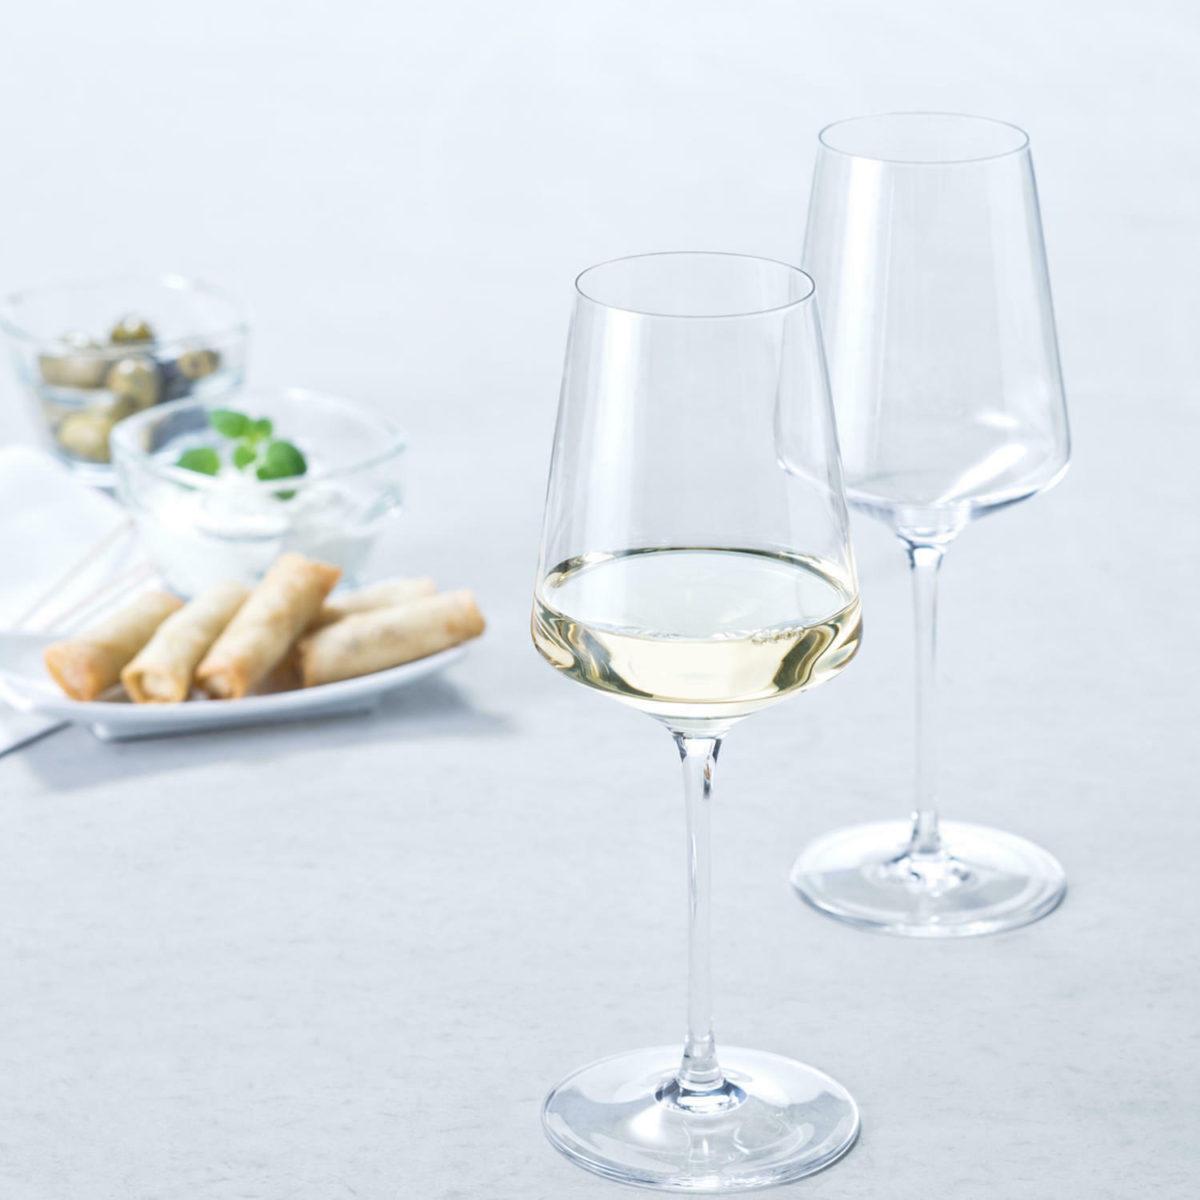 s l1600 1 9 1200x1200 - Pahar pentru vin alb Puccini 560 ml (L069553)